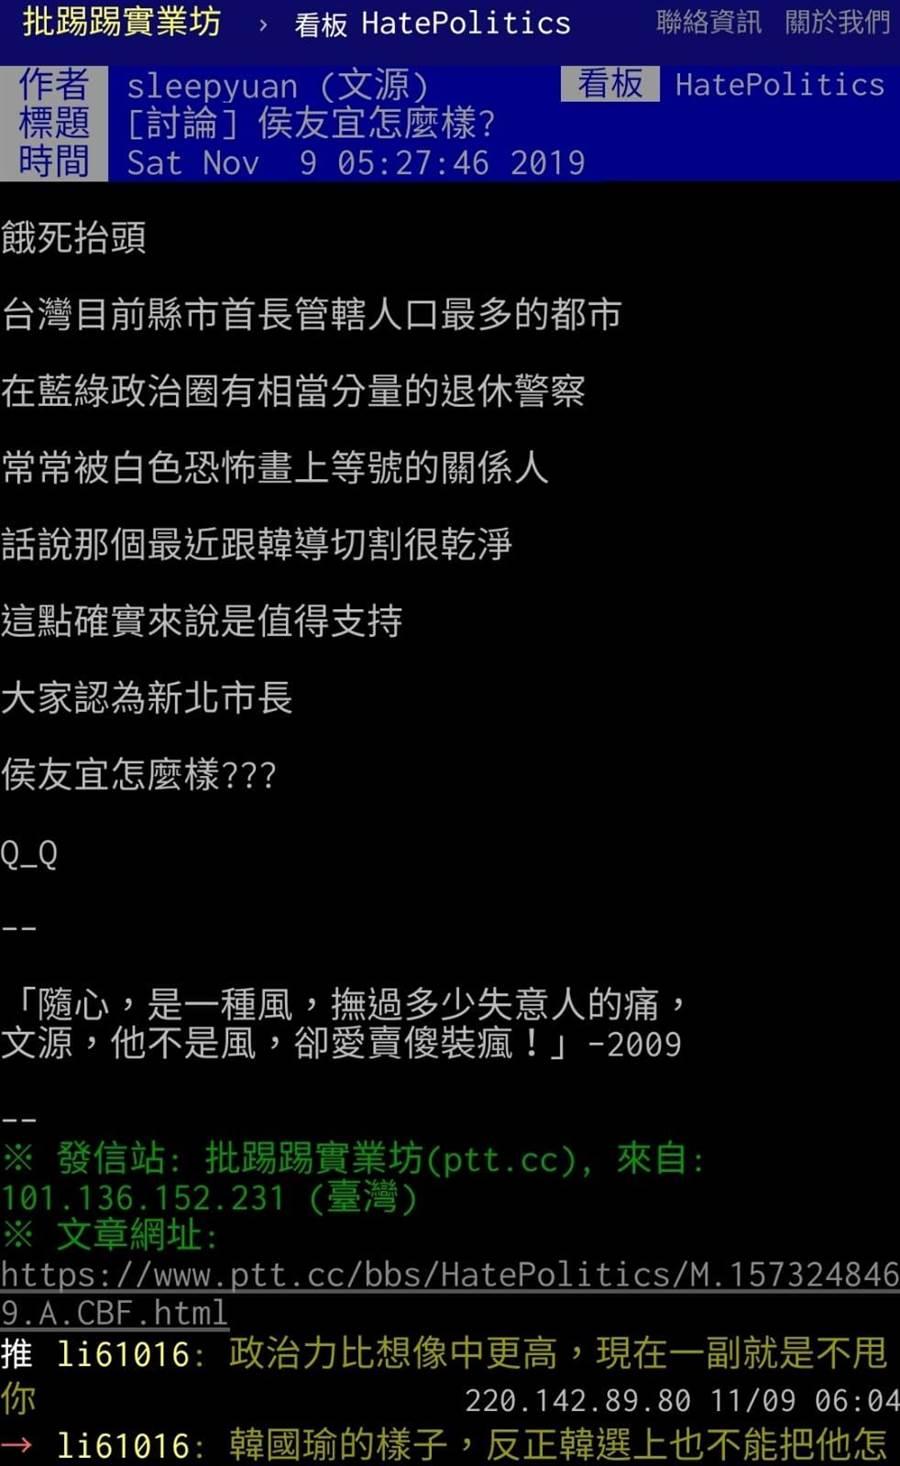 PTT網友發文。(圖/翻攝自「批踢踢實業坊」)